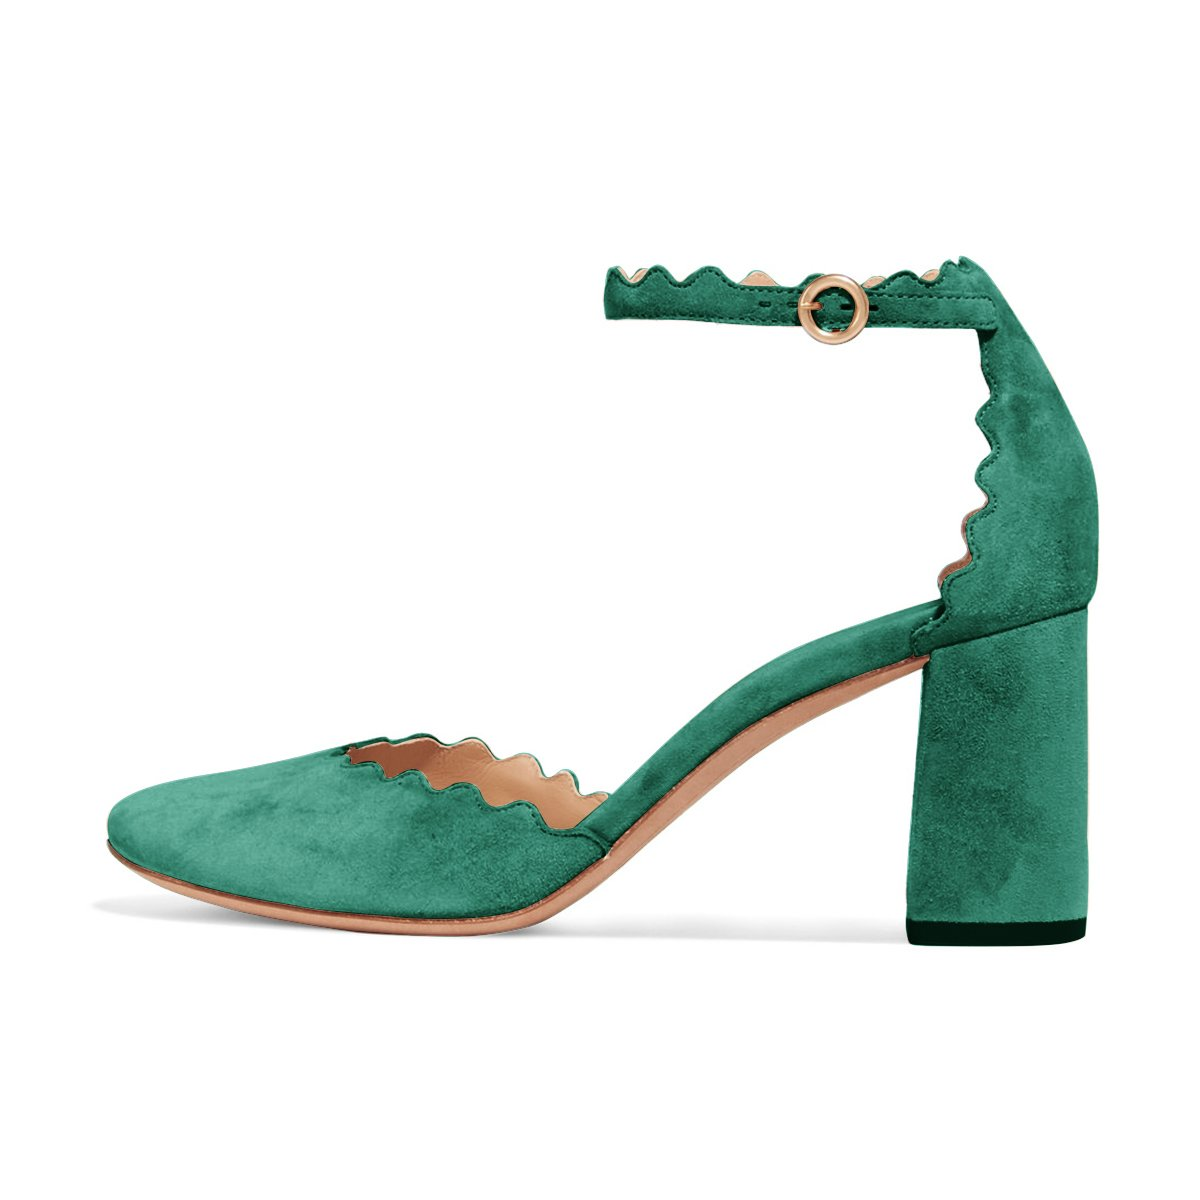 FSJ Women Comfortable Ankle Strap Pumps Block Chunky Heels Round Toe D'Orsay Shoes Size 4-15 US B078J6NDMK 14 M US|Turquoise